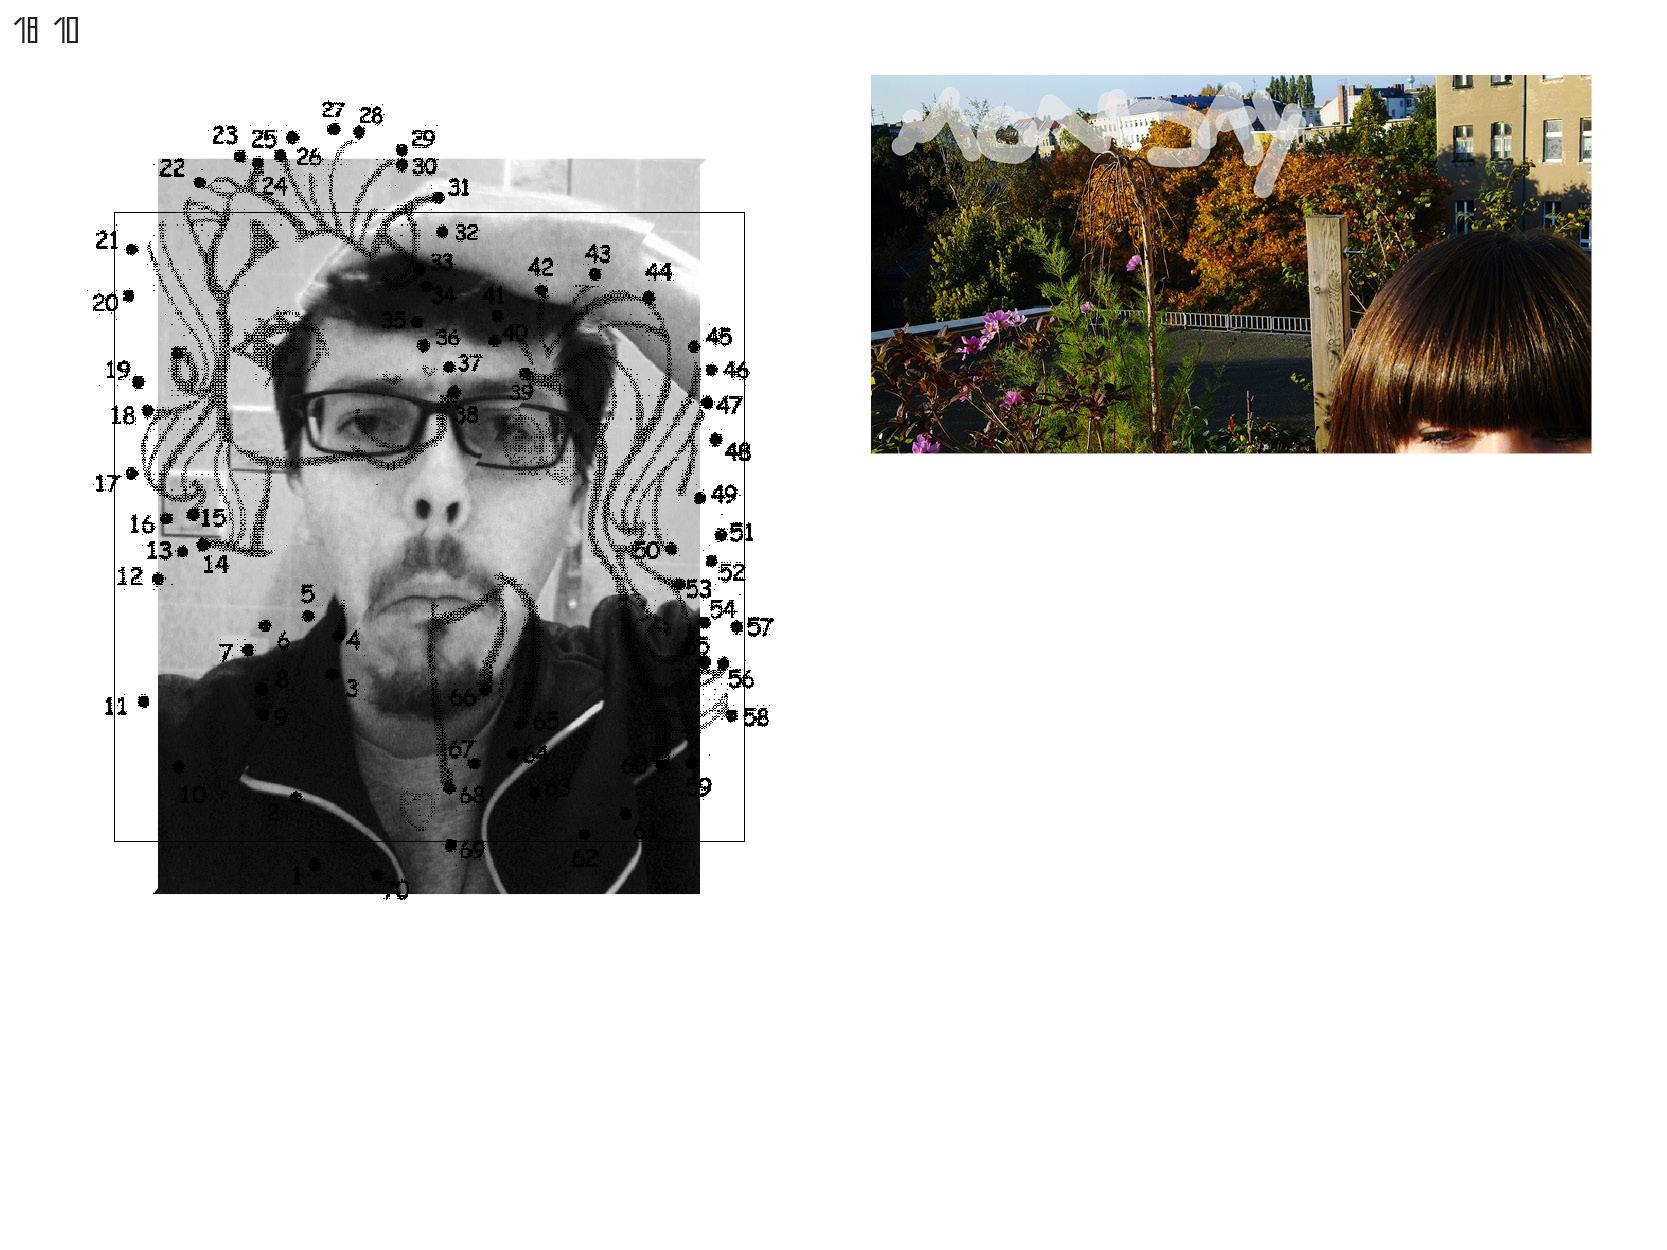 Gerrit-Schweiger-Dialog-Städte-Paris-Berlin-Jessica-Blank-Experiment-Fotoserie-Tagebuch-visuelle-Kommunikation-3